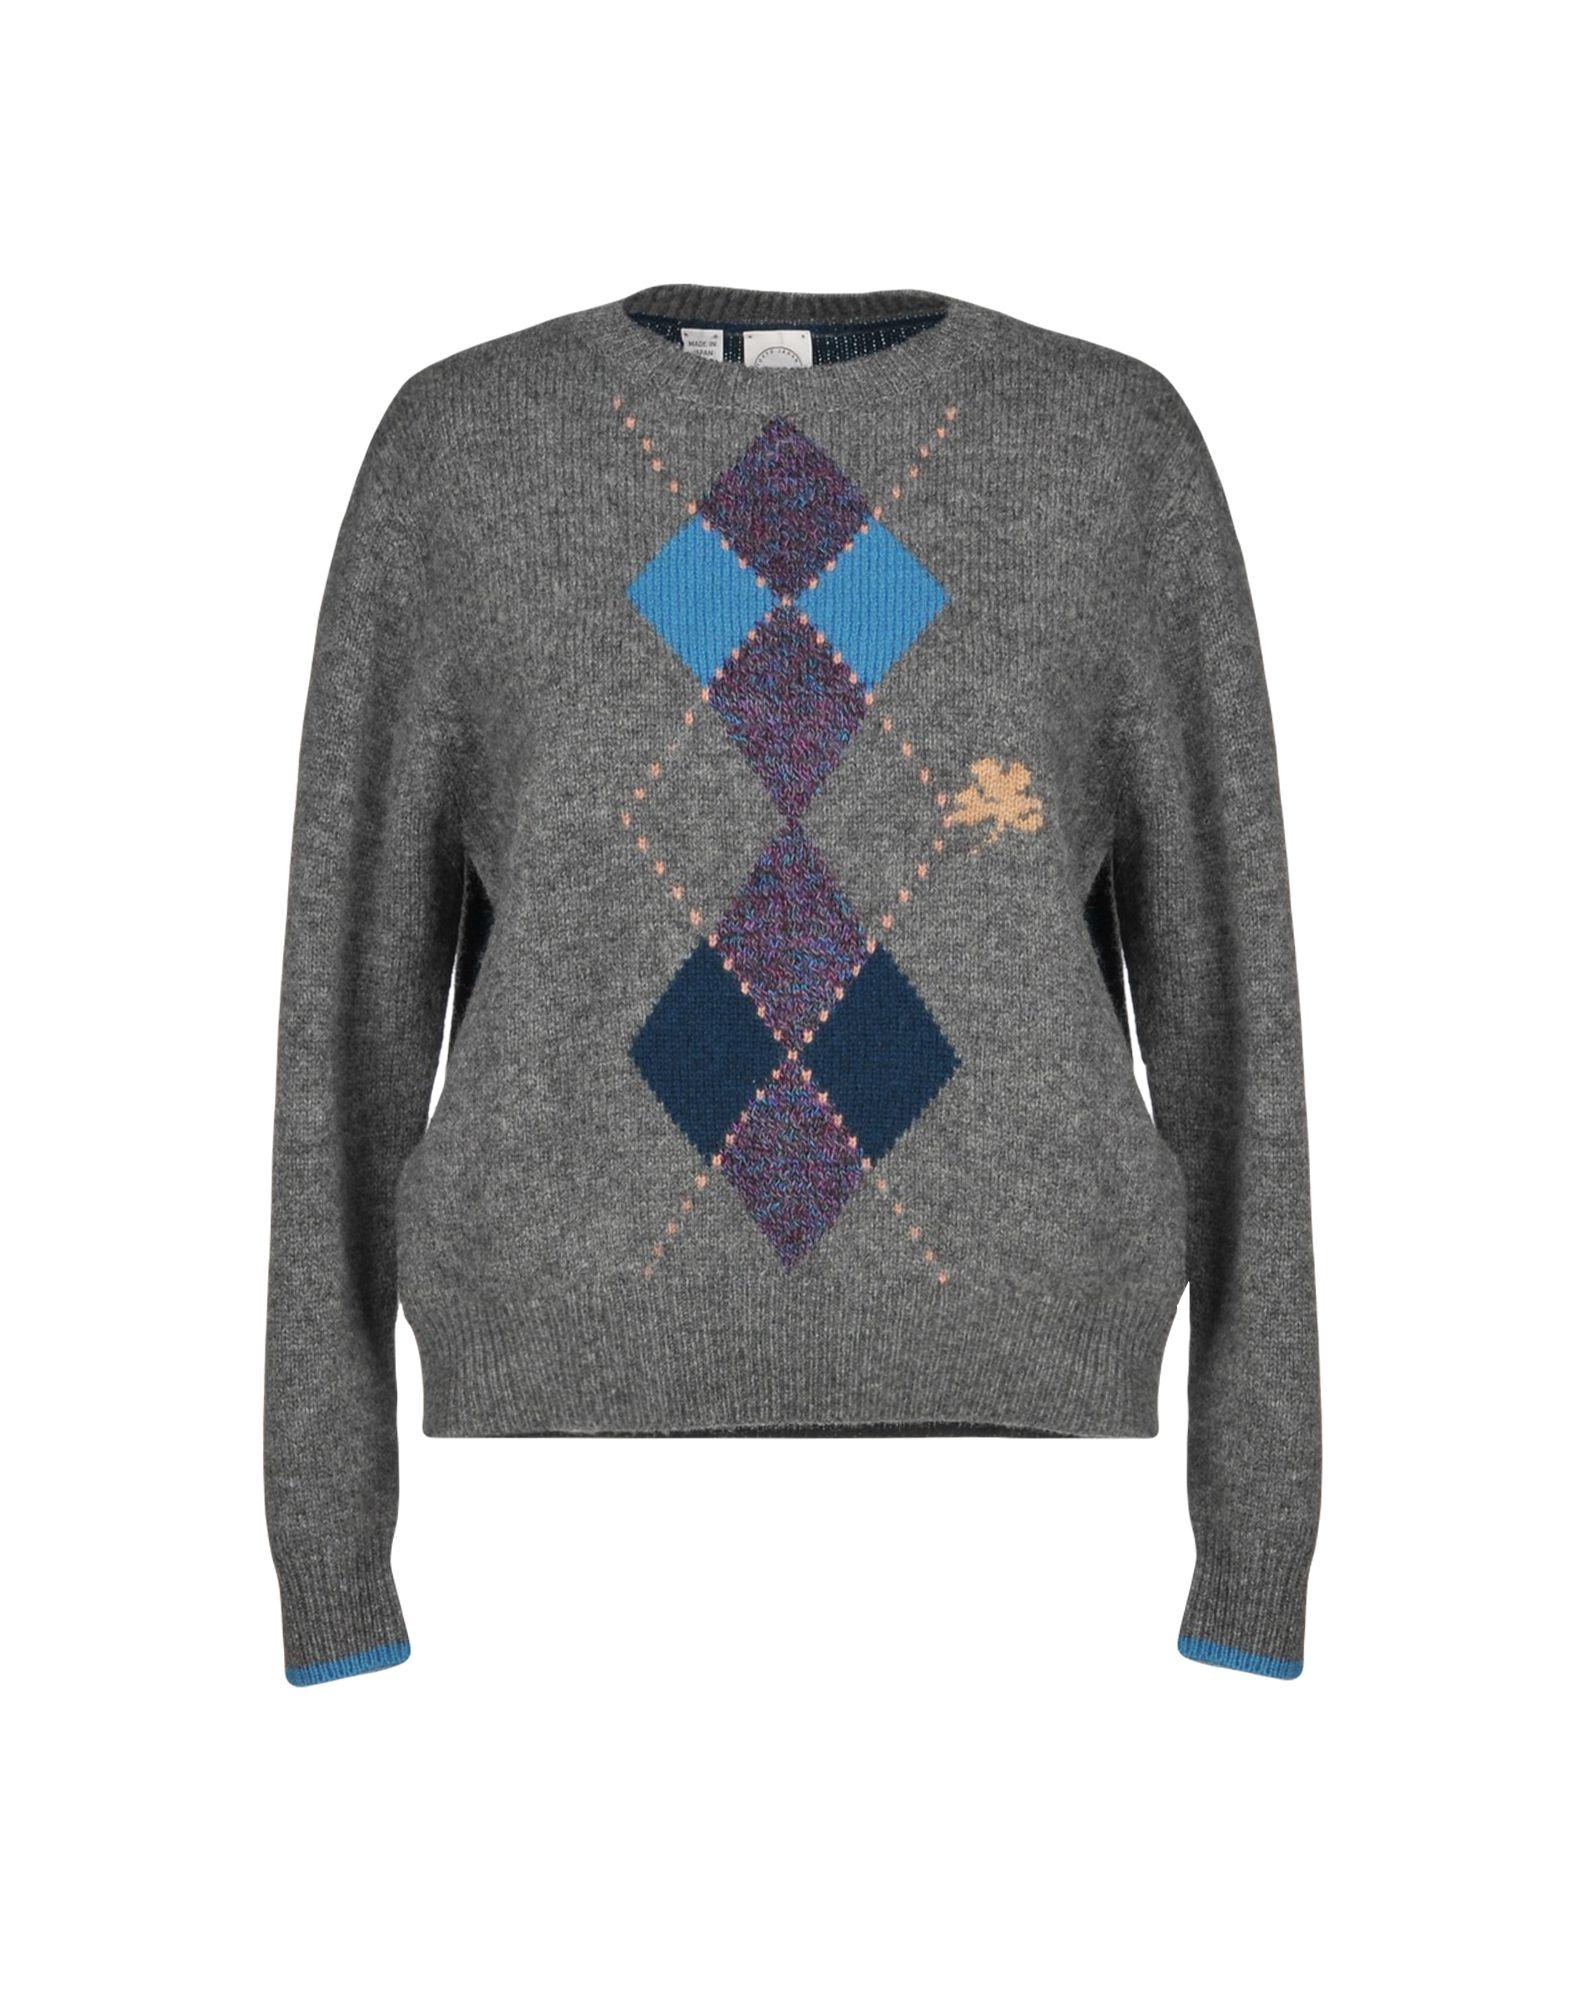 ANTIPAST Sweater in Grey